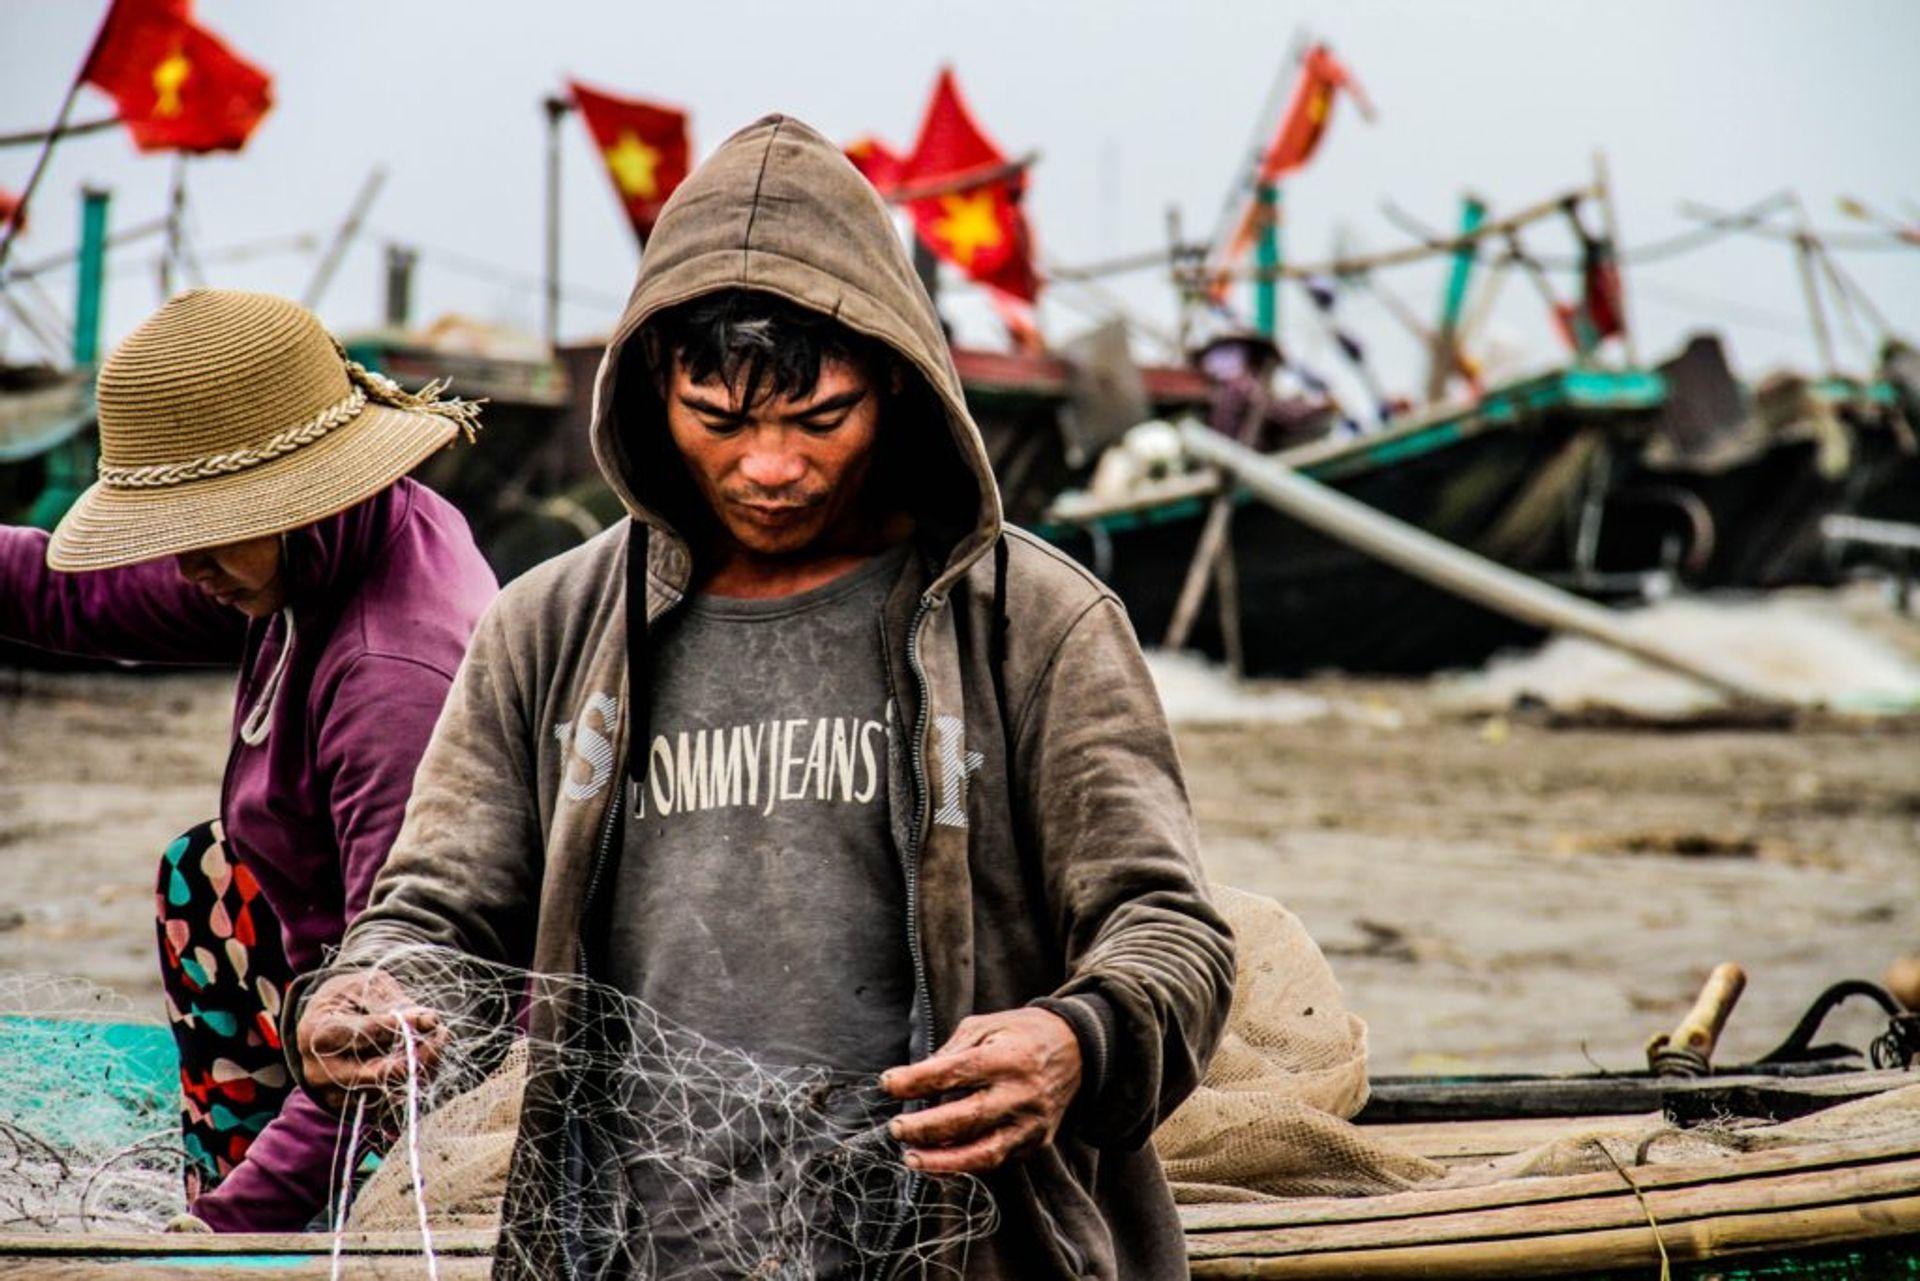 A fisherman looking at a fishing net.